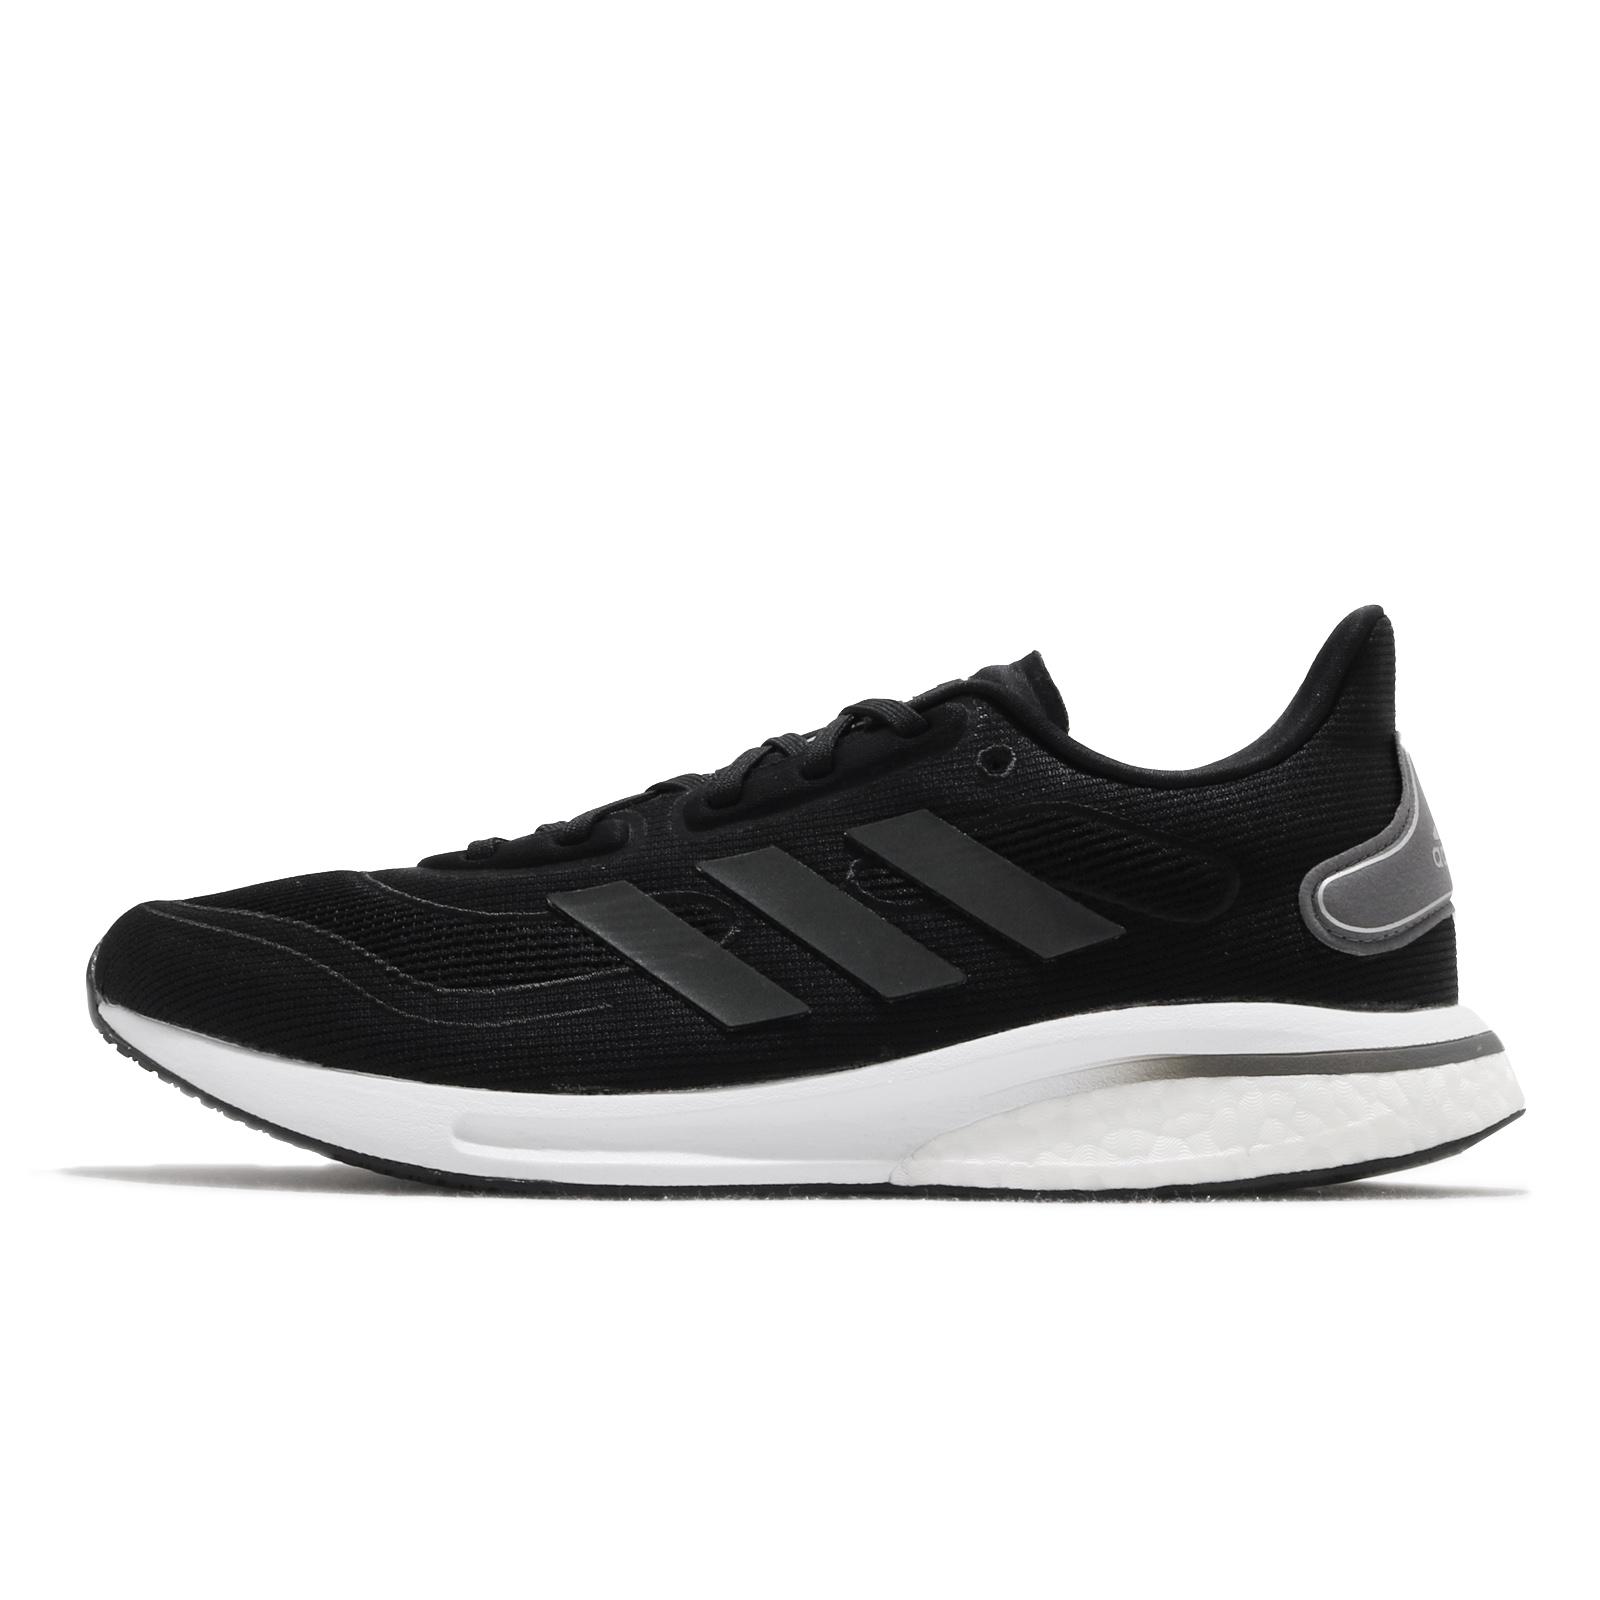 adidas 慢跑鞋 Supernova M 黑白 反光 路跑 愛迪達 男鞋 運動鞋 【ACS】 EG5401